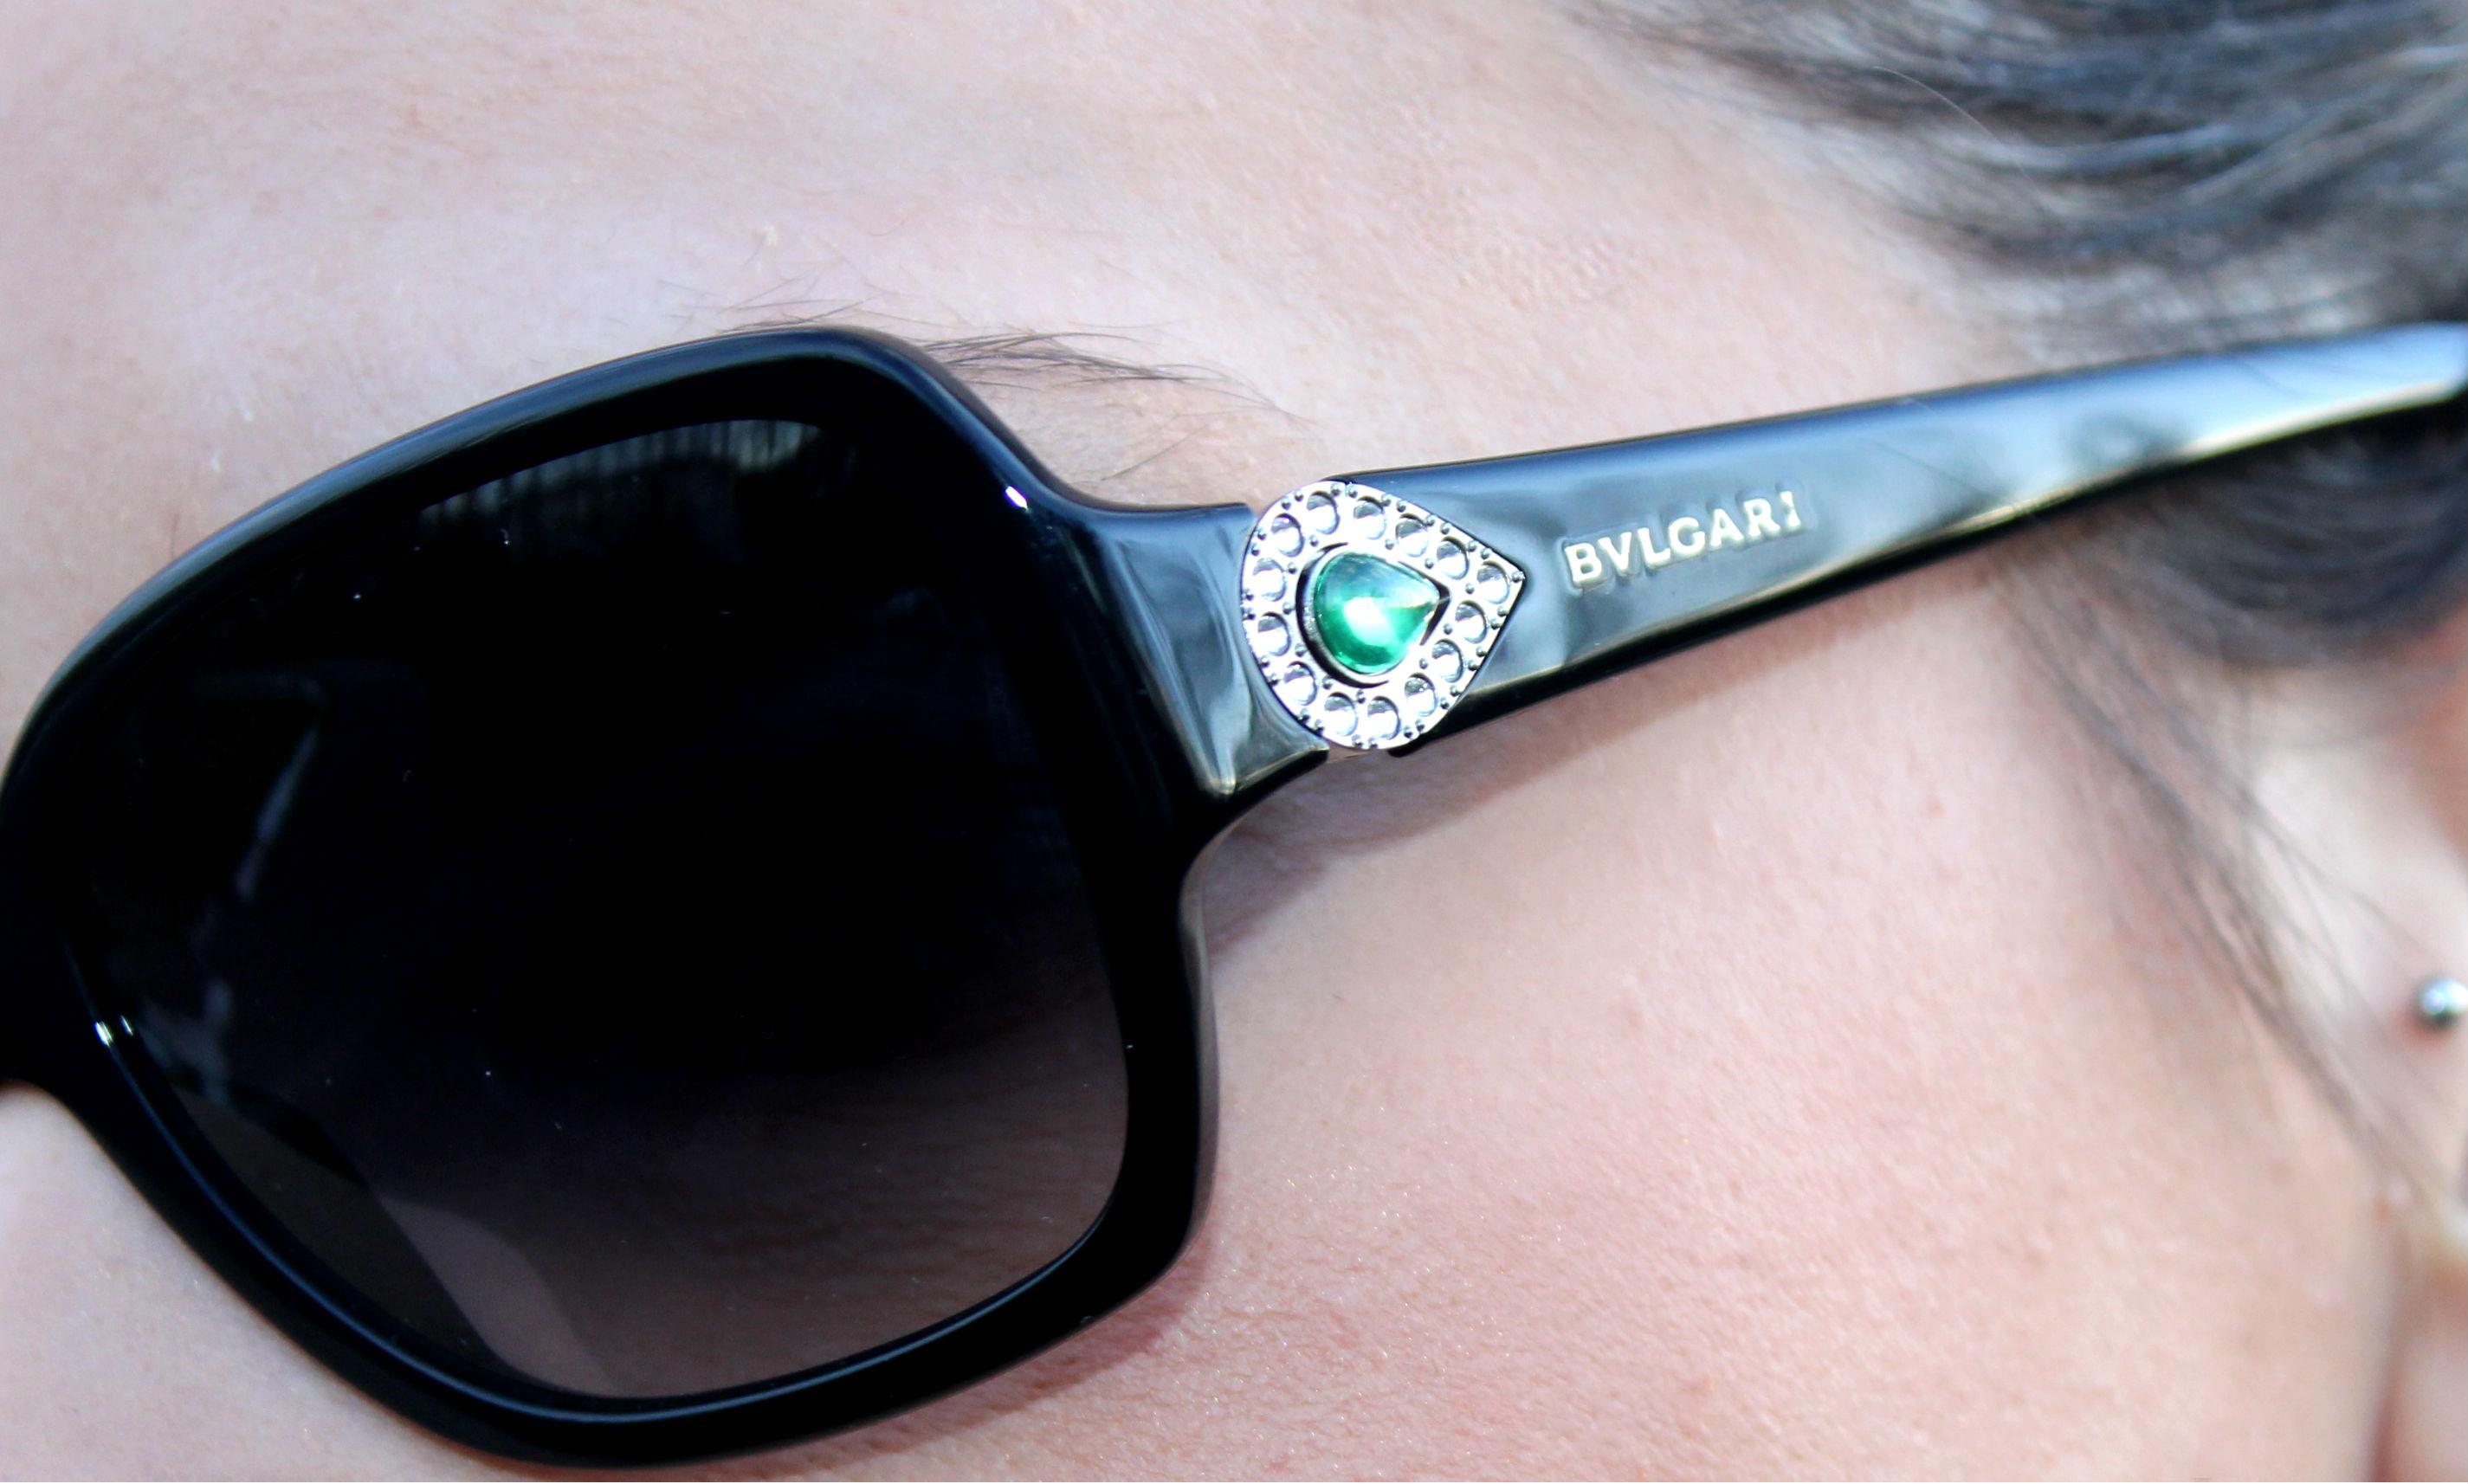 bulgari-sunglasses-giarre.com